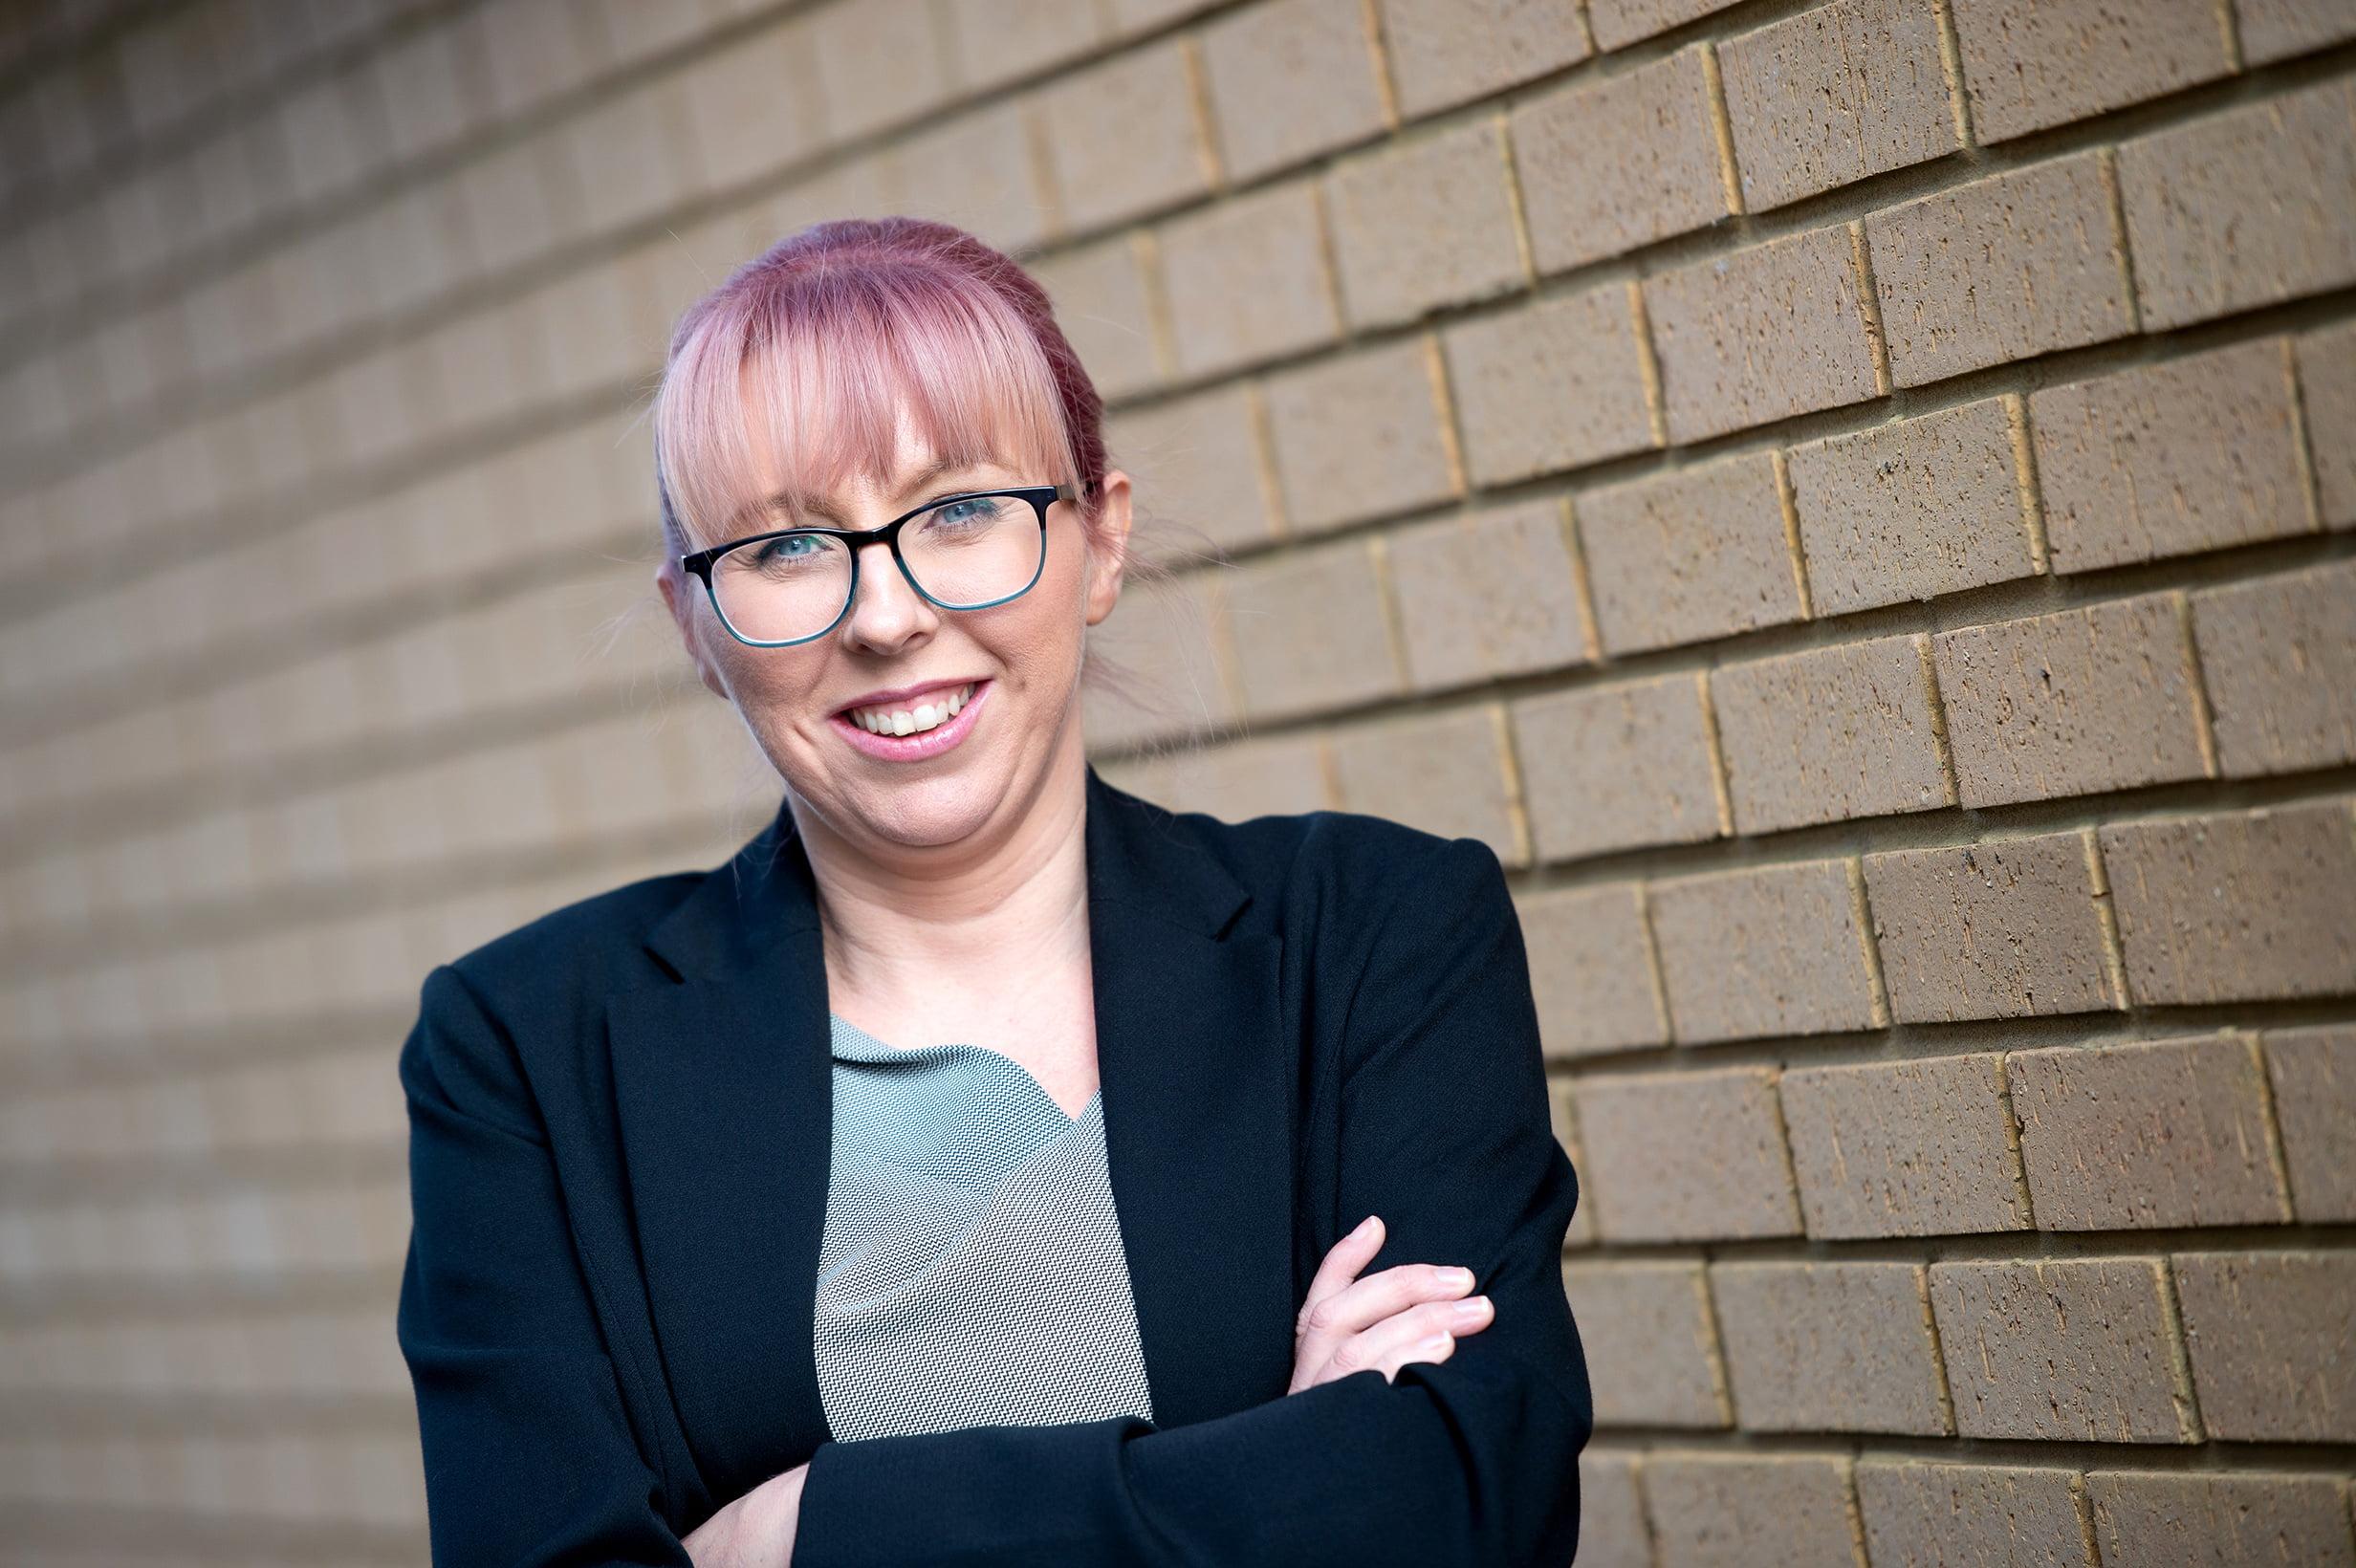 Kerrie Nixon